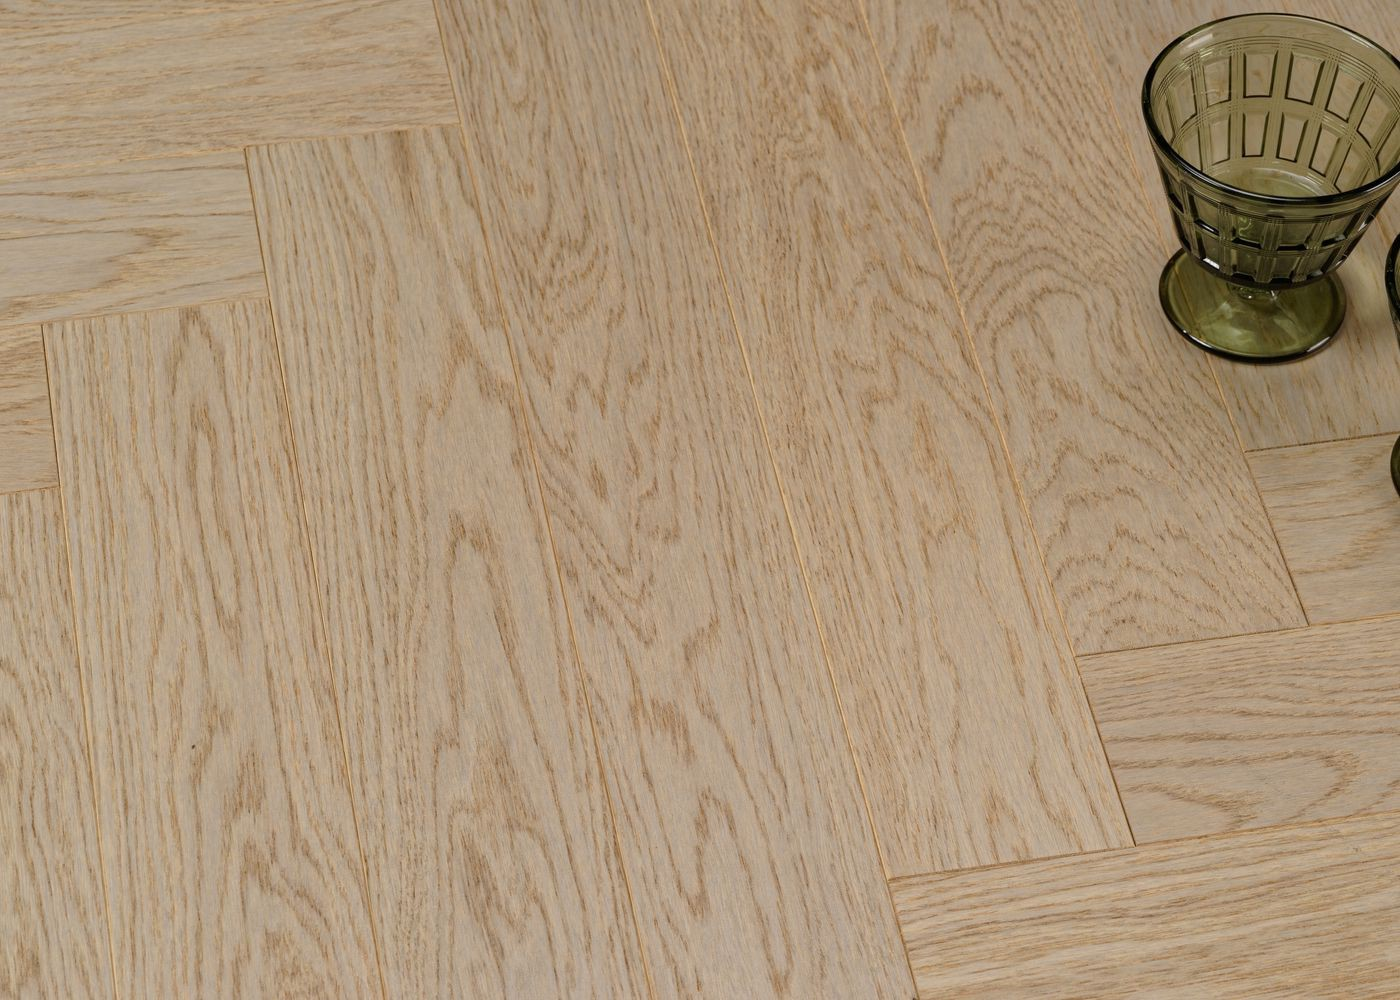 Parquet chêne contrecollé CATANE Bâton Rompu brossé vernis mat Select support HDF 10x92x610